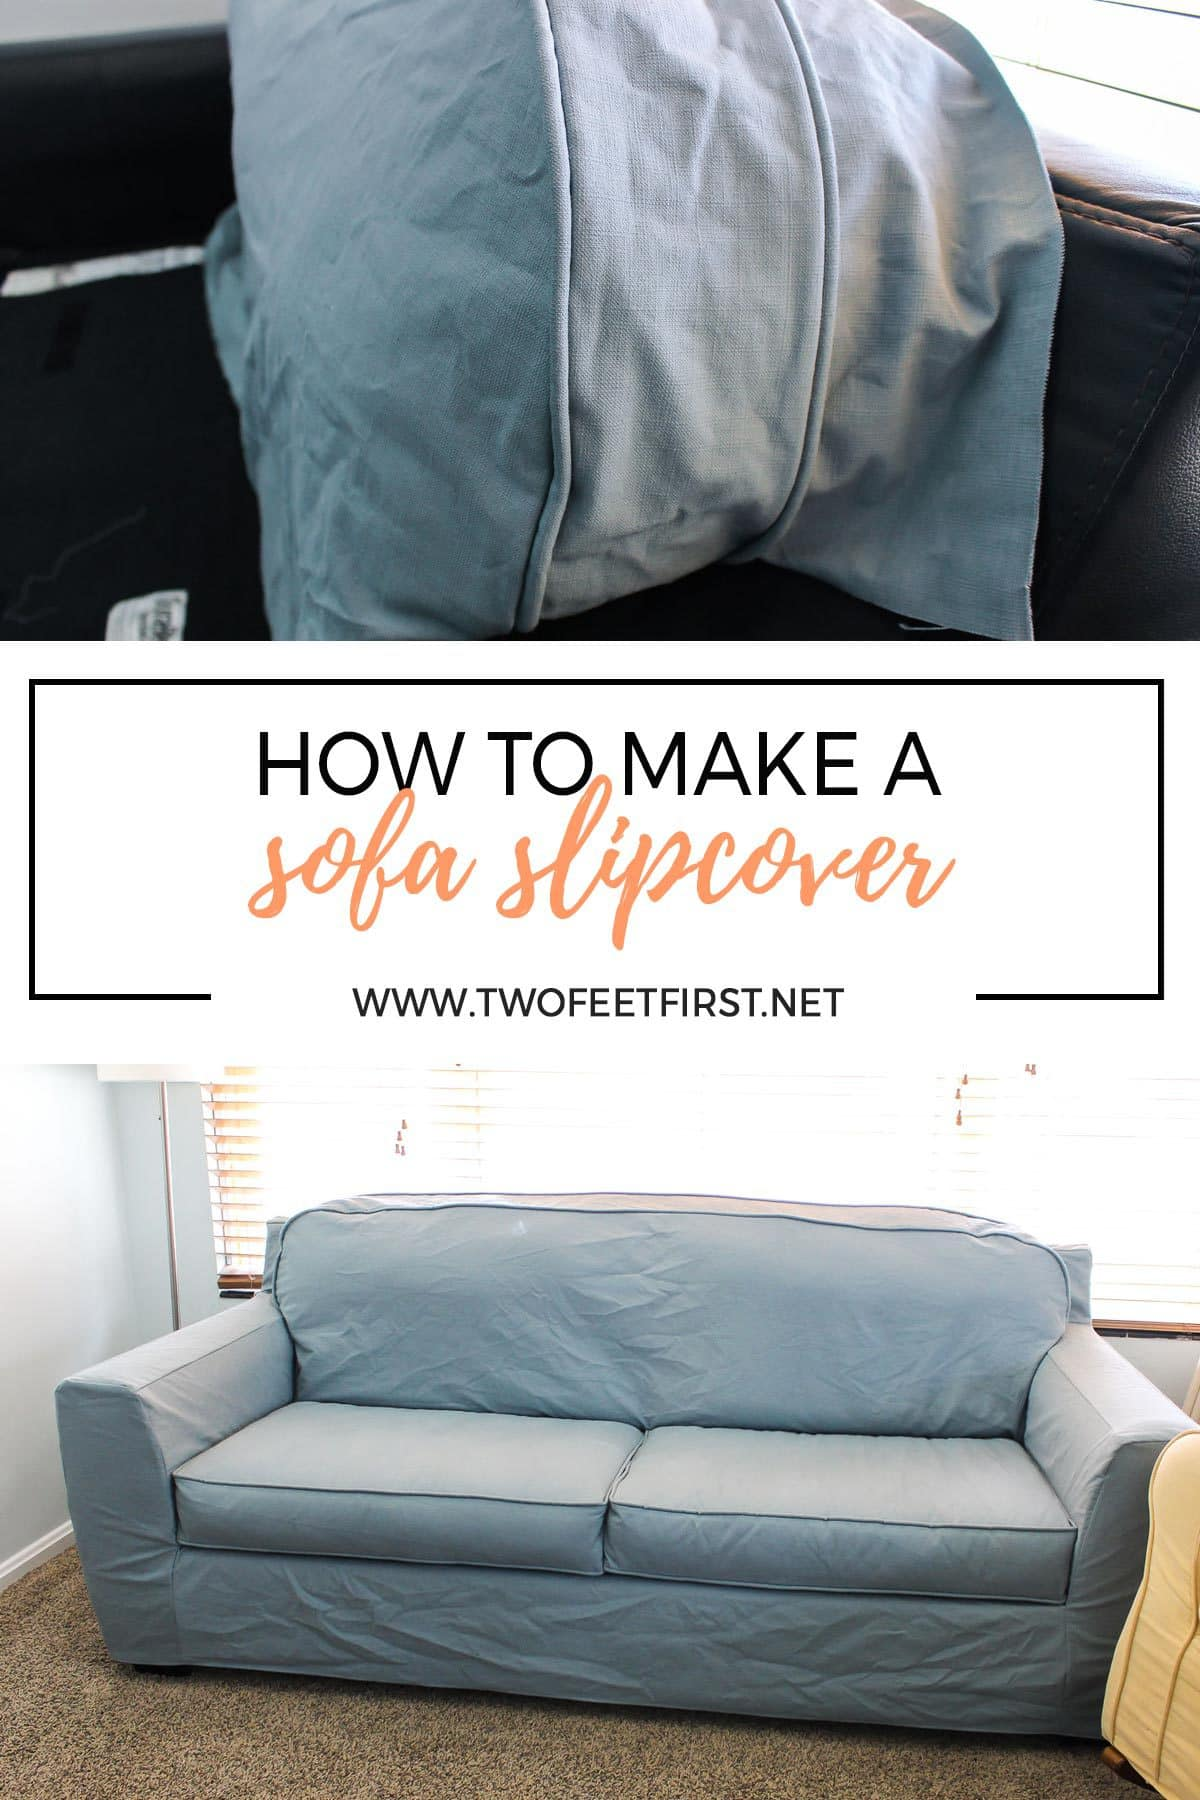 Beau How To Make A Sofa Slipcover?resizeu003d600,900u0026sslu003d1